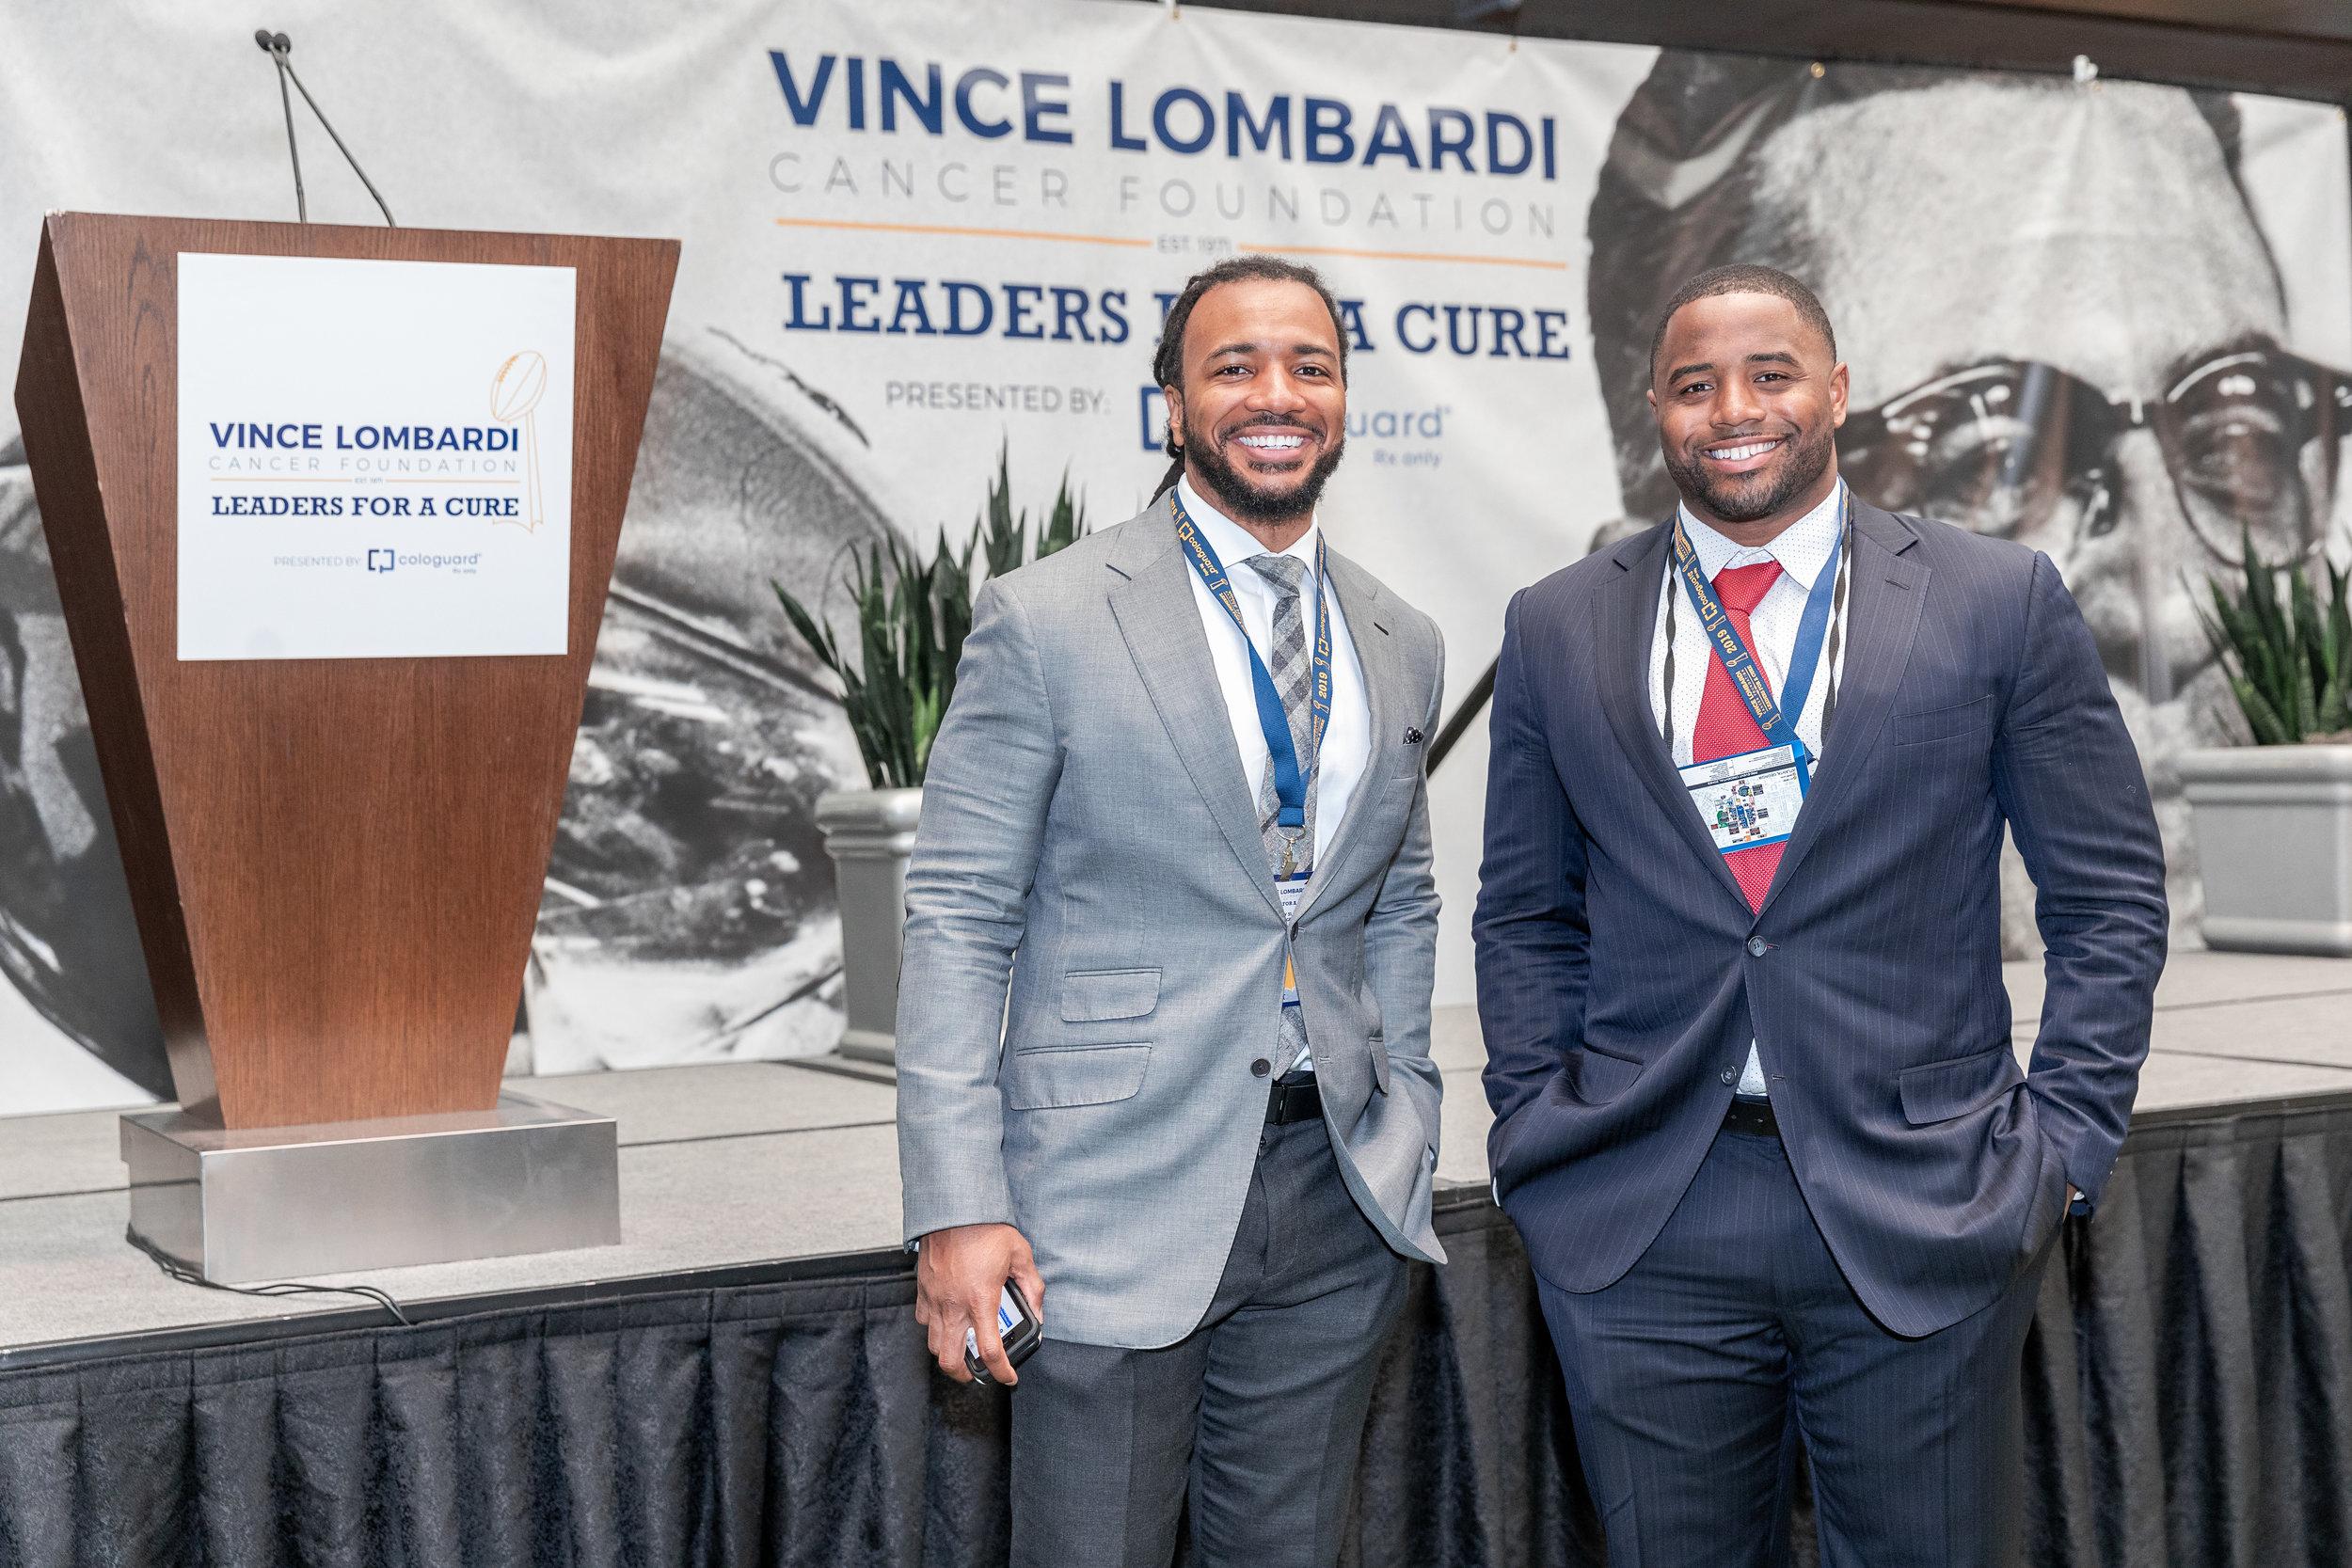 Vince Lombardi Cancer Foundation Event -20190131-0174-Edit.jpg